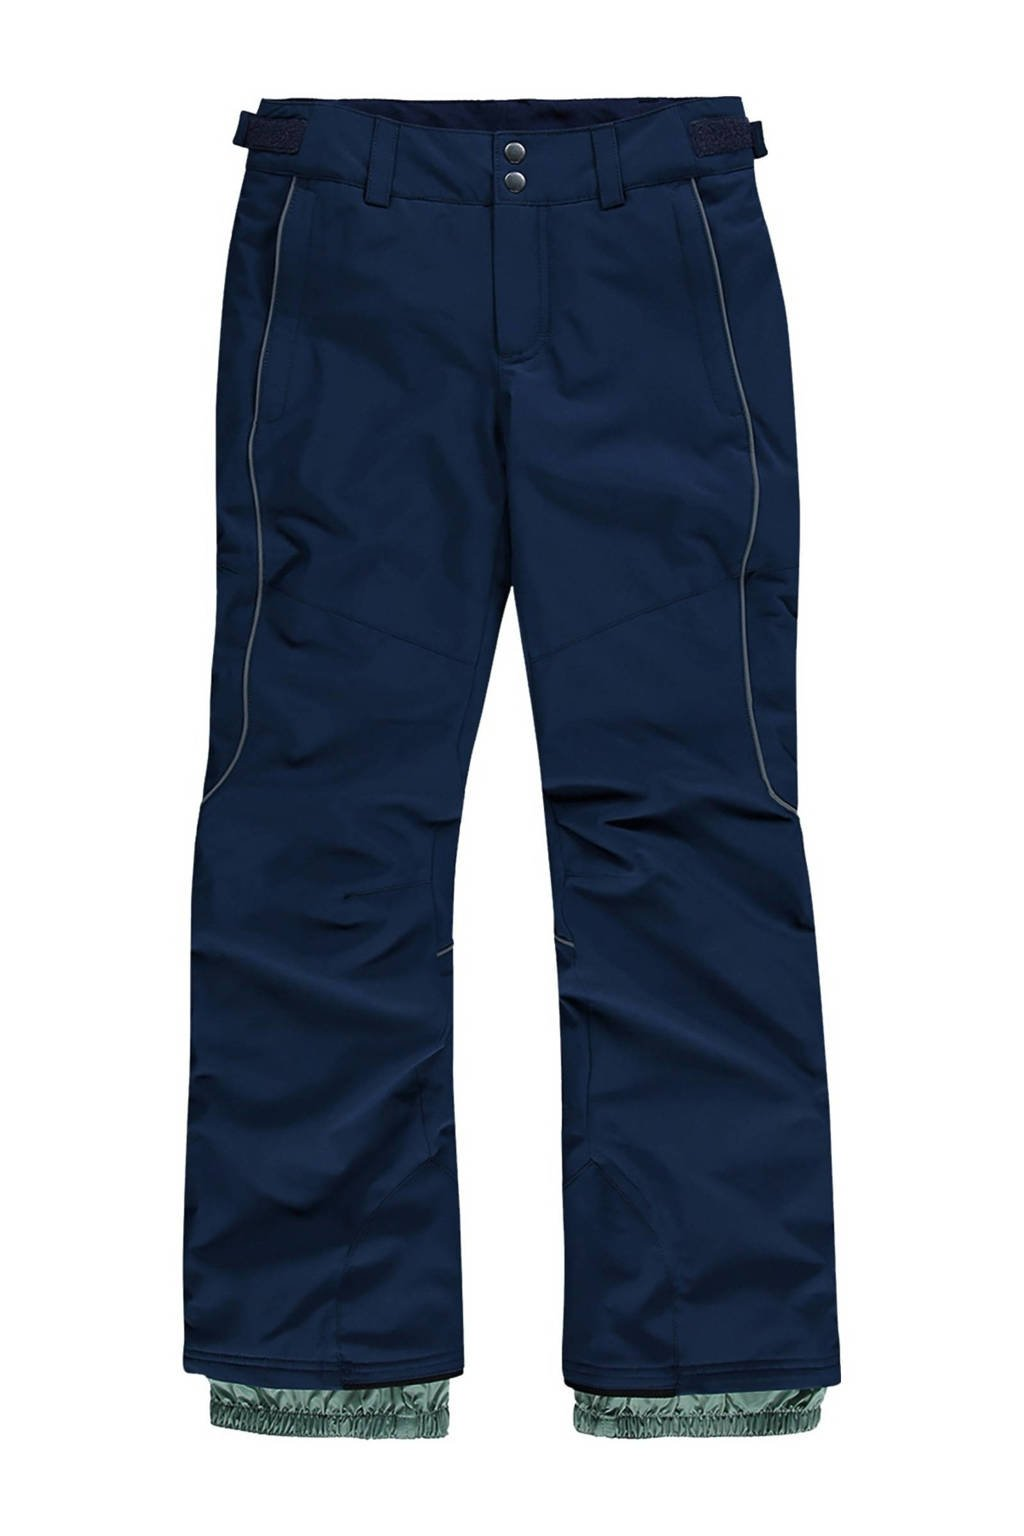 O'Neill skibroek Charm donkerblauw, Scale